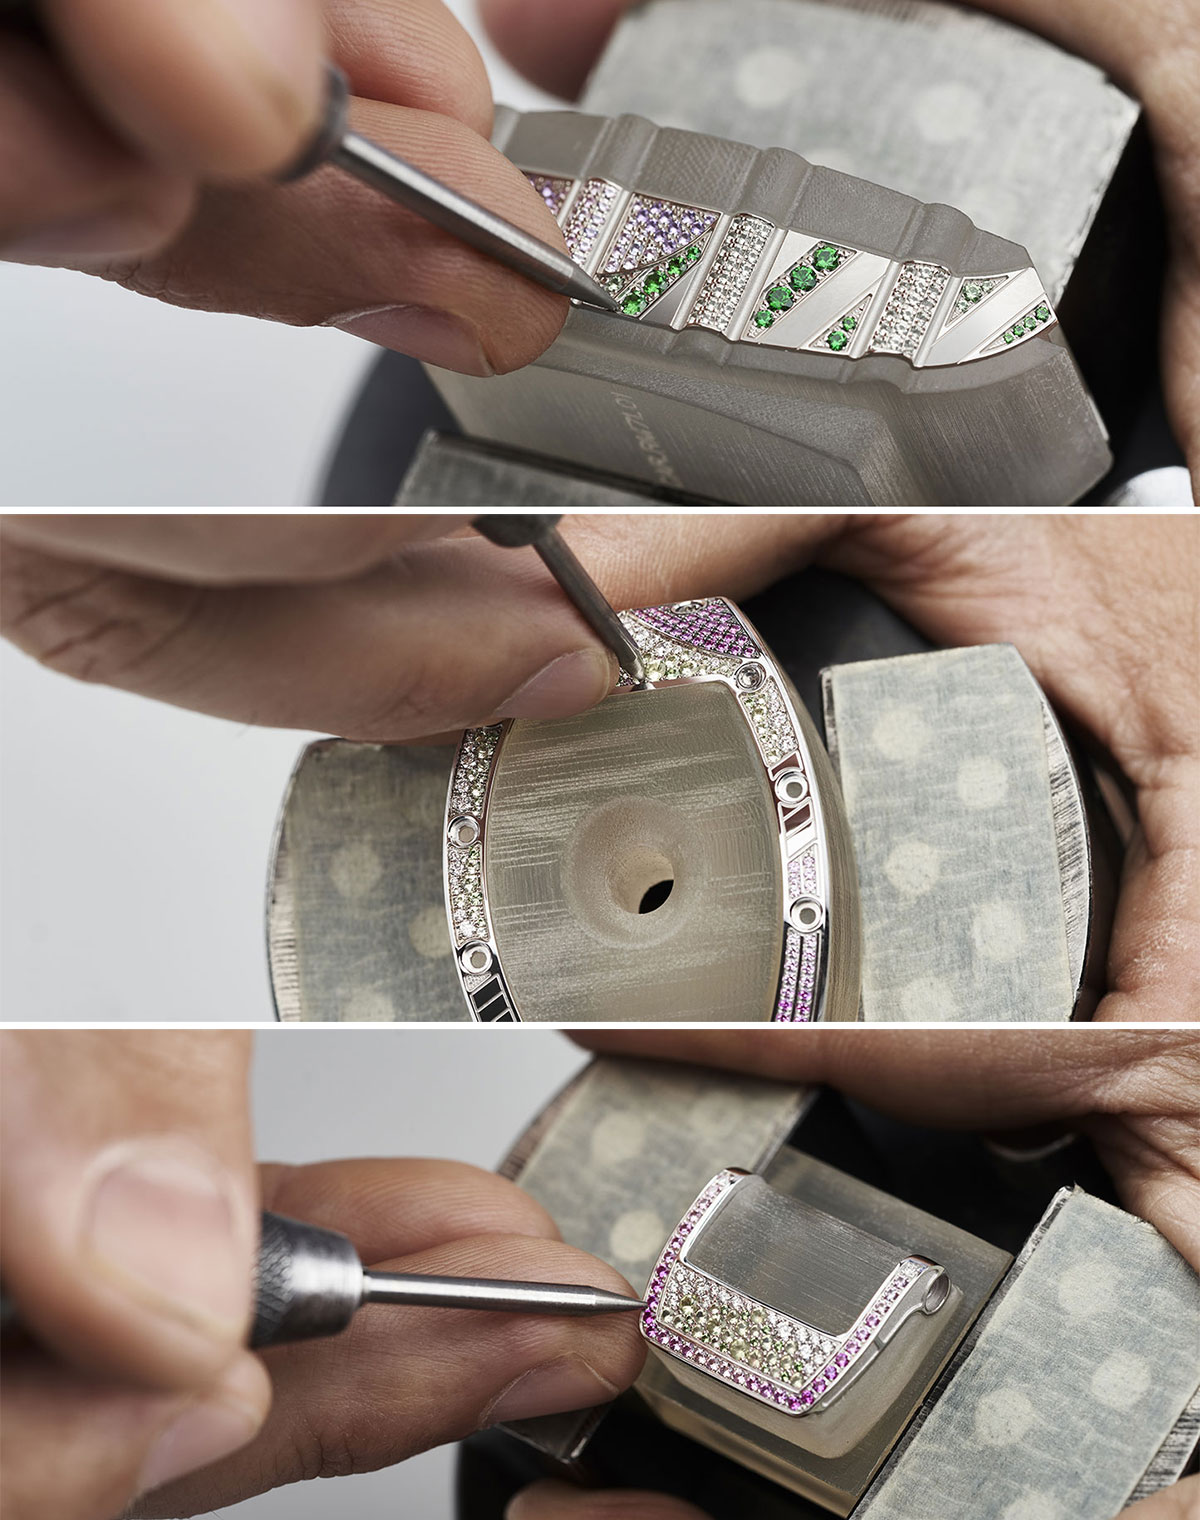 Đồng hồ RM 71-02 Automatic Tourbillon Talisman Savoir Faire